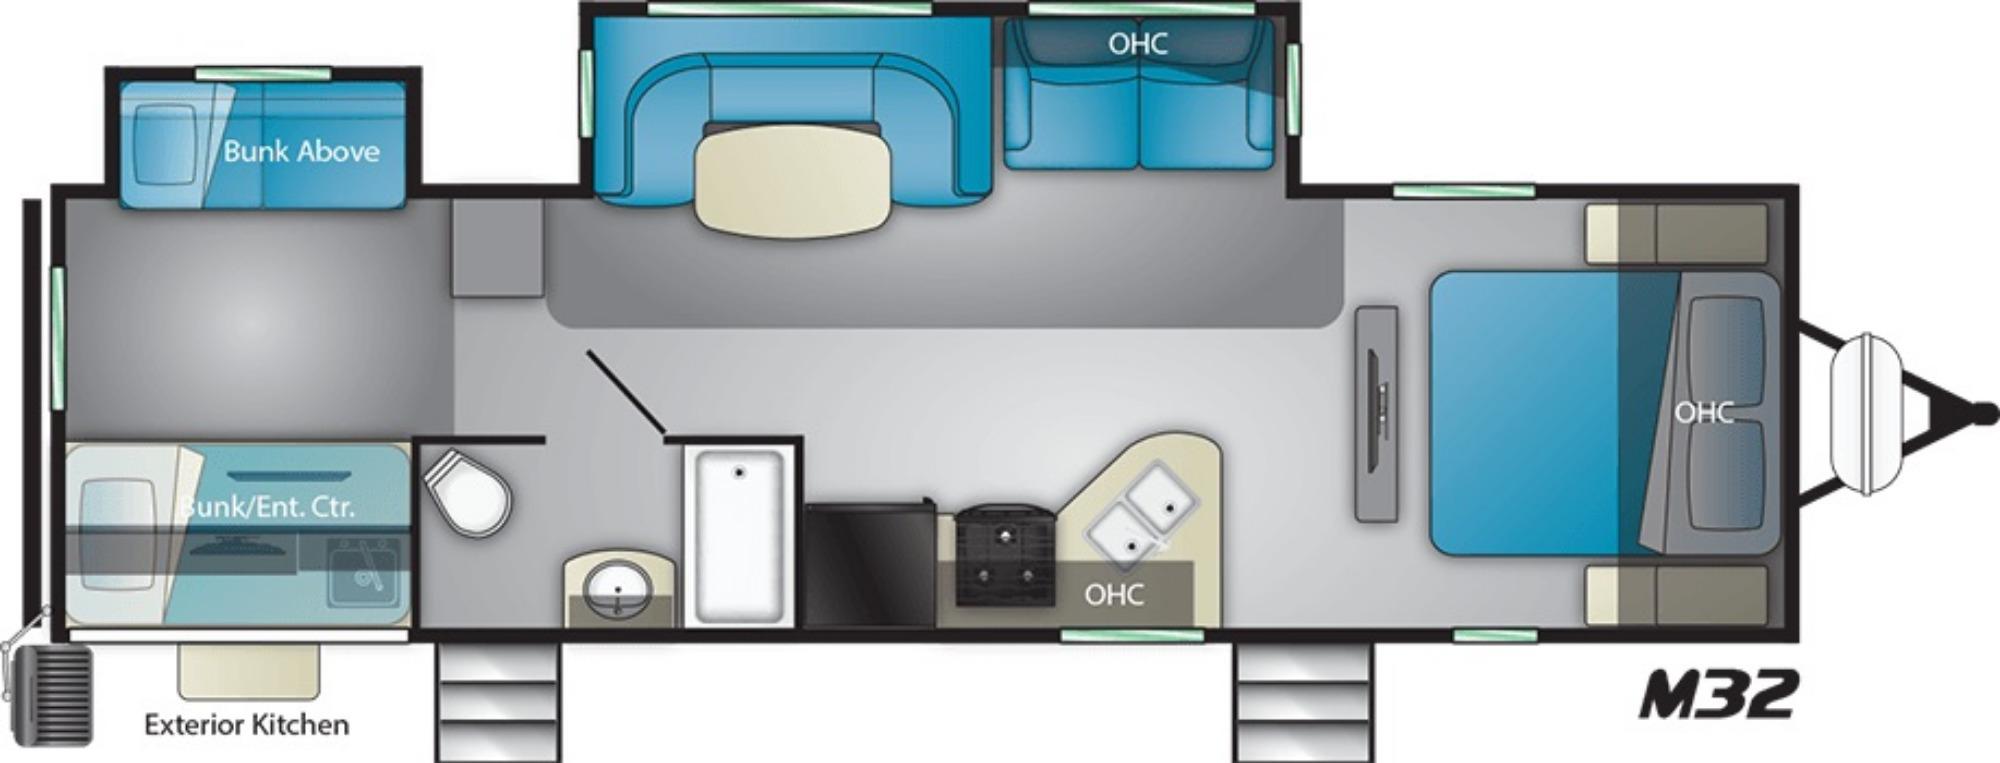 View Floor Plan for 2020 HEARTLAND MALLARD M32